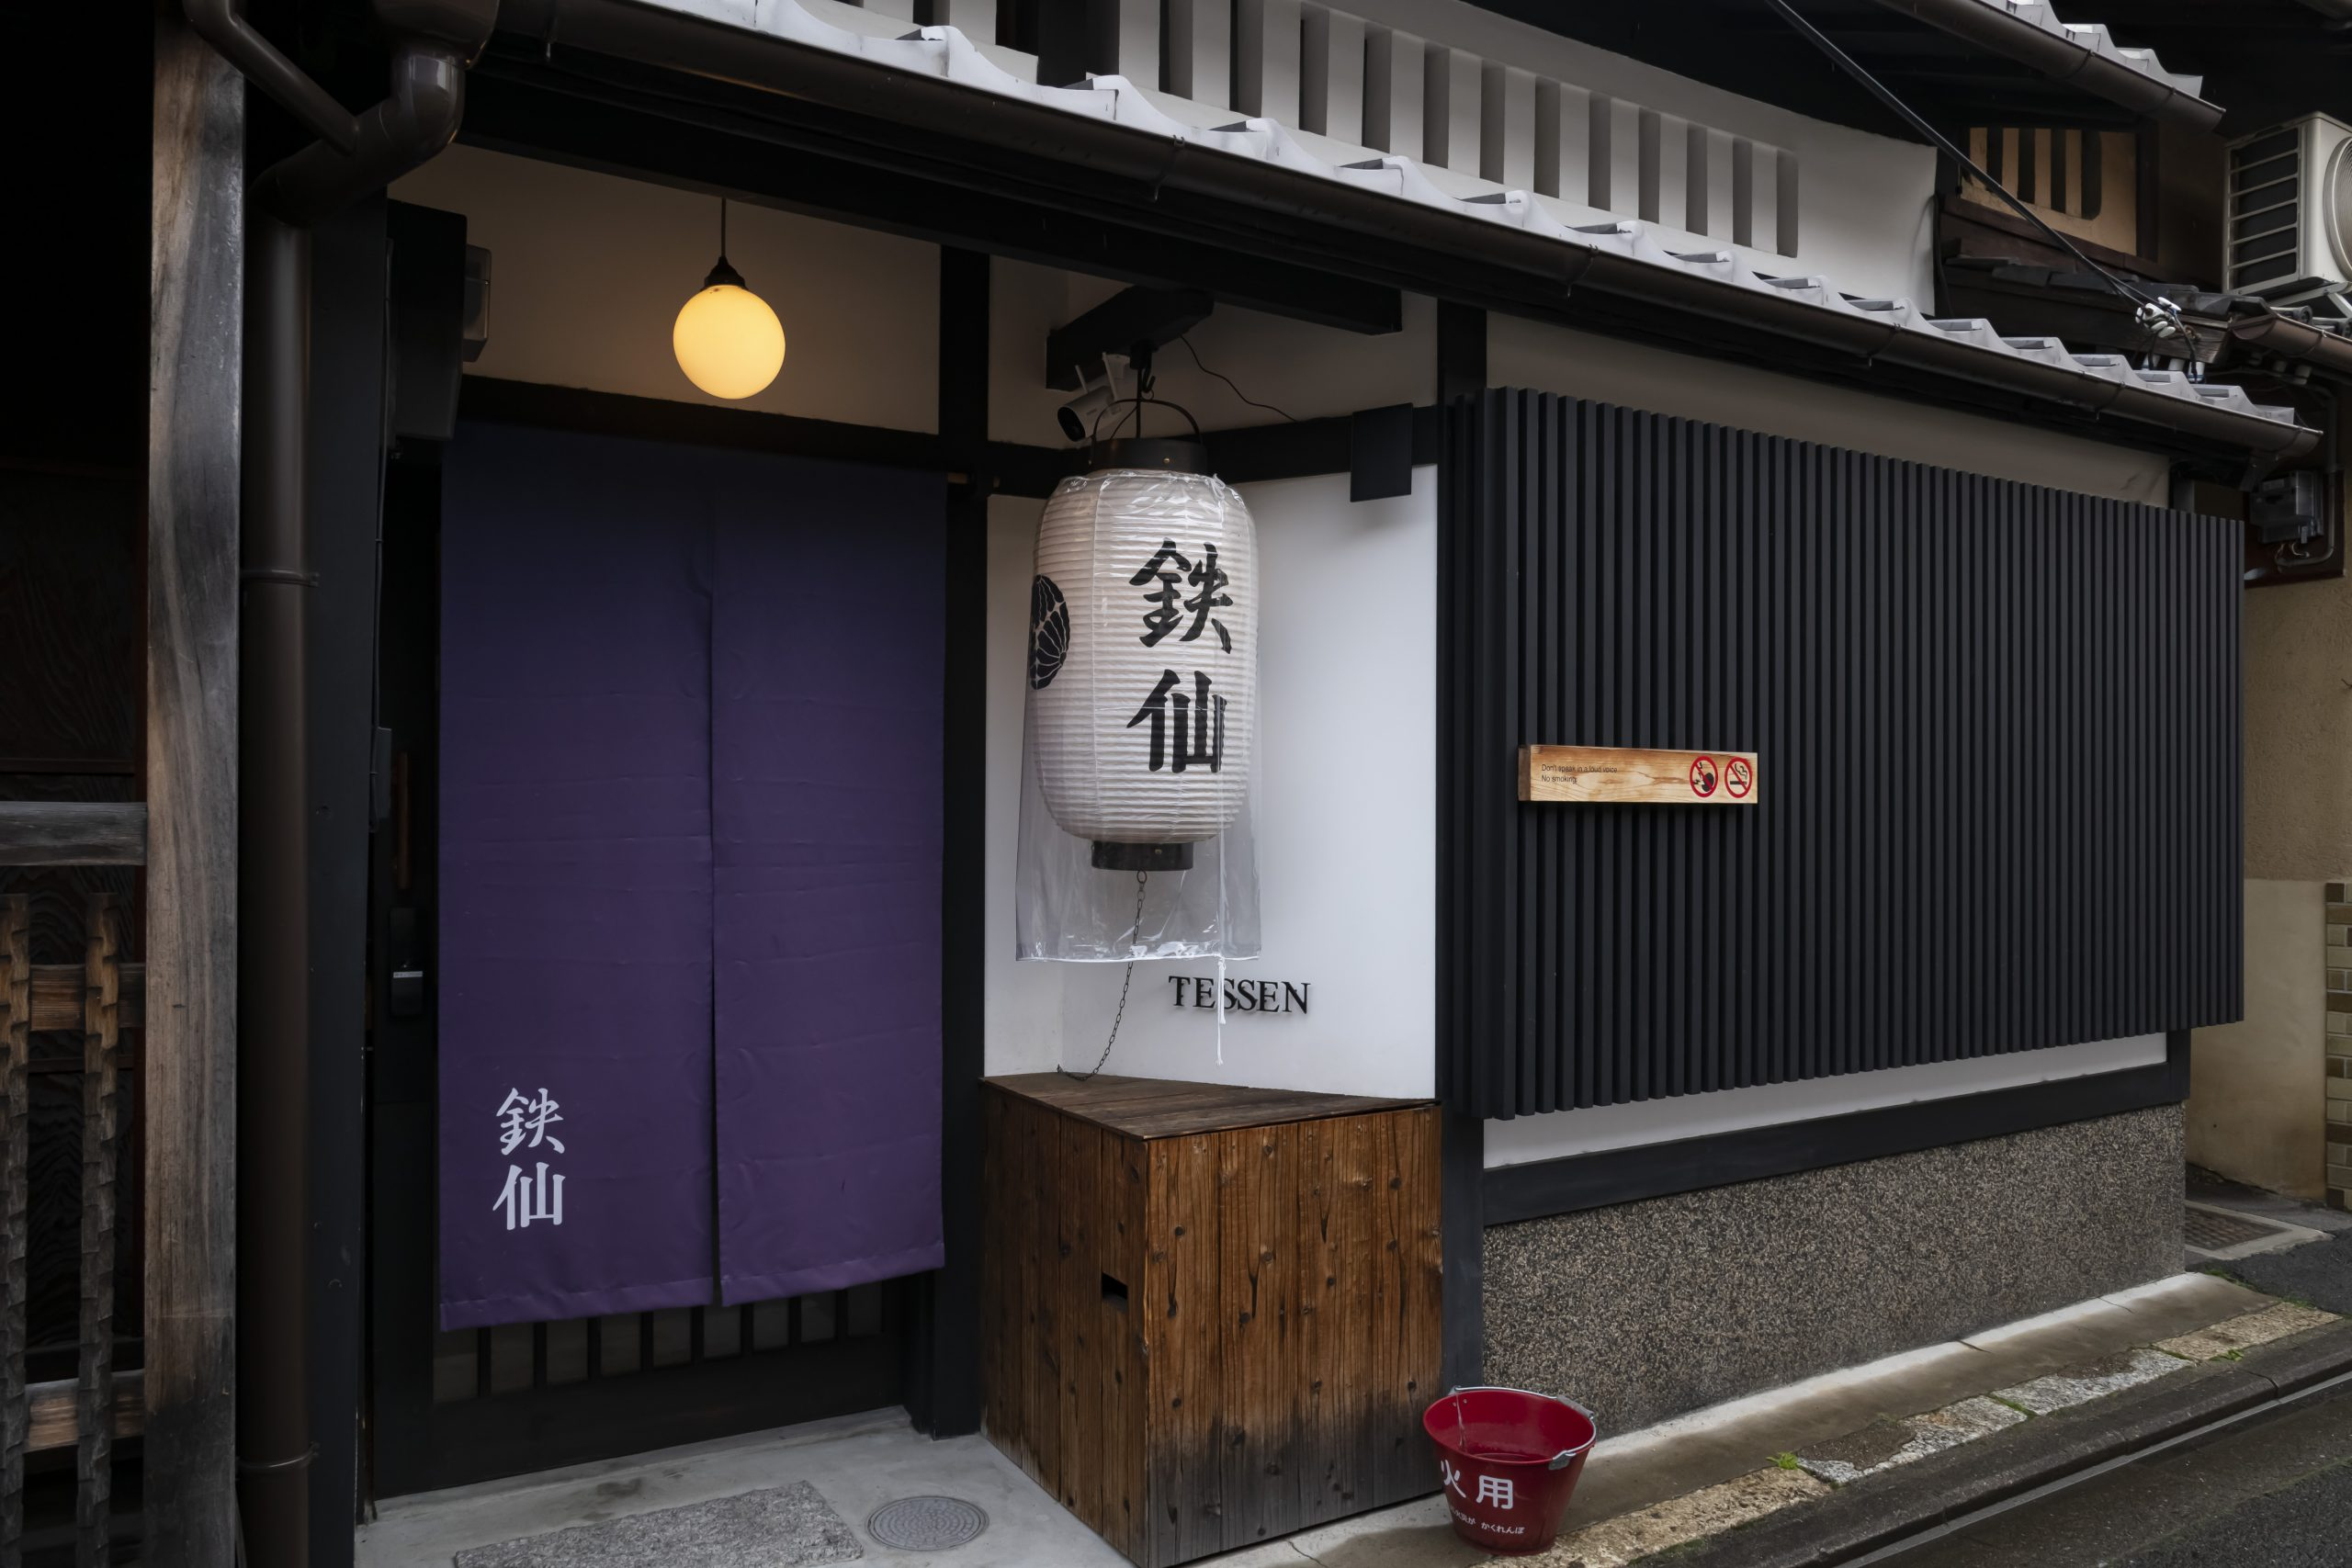 京都一軒町家 さと居 大宮五条 鉄仙(TESSEN)